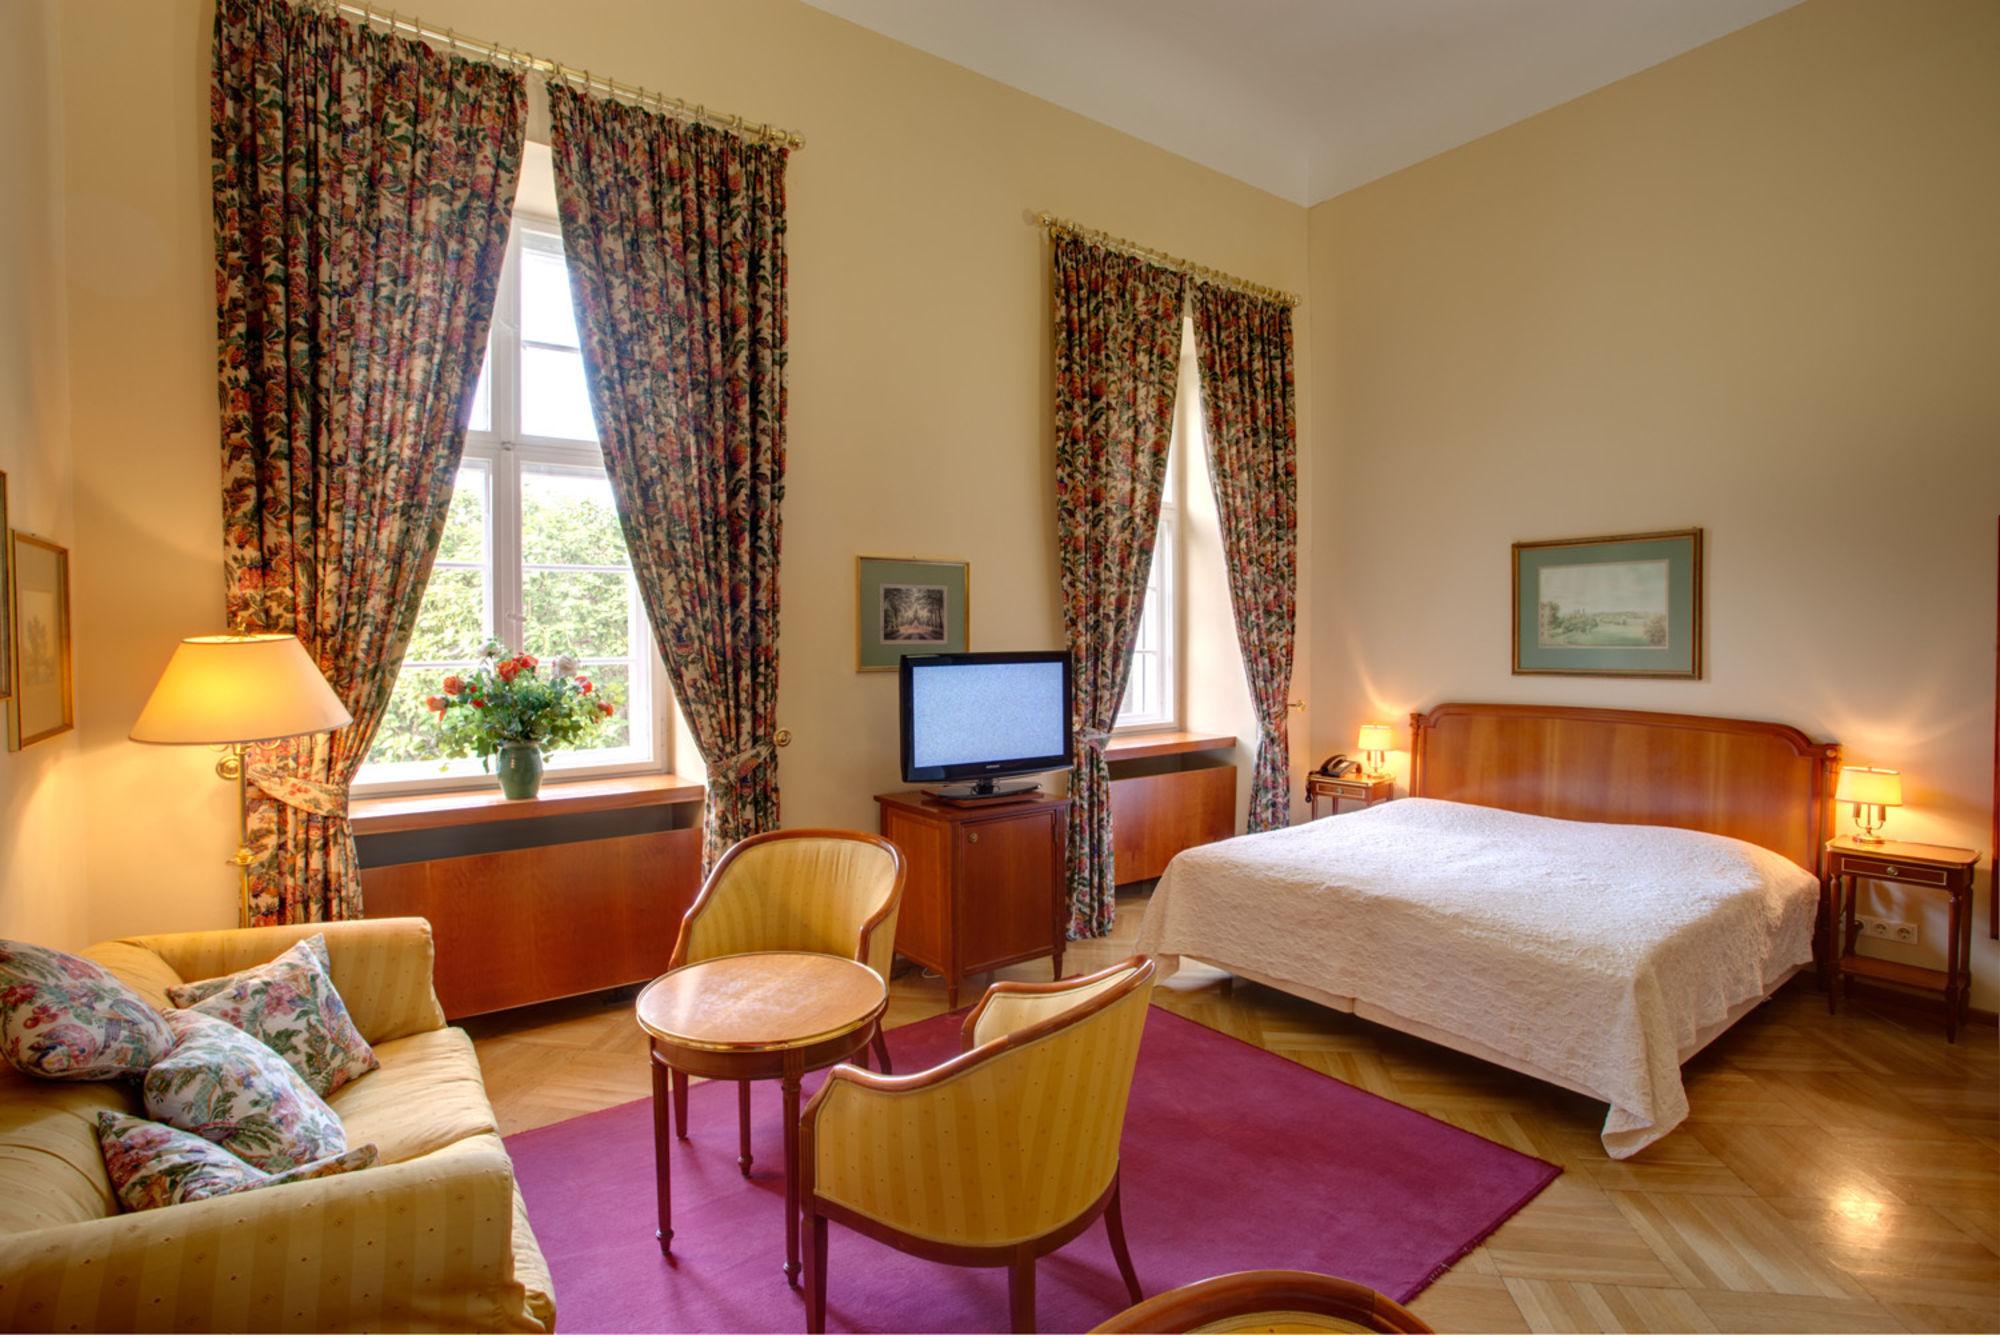 Urlaub Spreewald - Schloss-Hotel - Zimmer - Doppelzimmer - Schloss Lübbenau im Spreewald